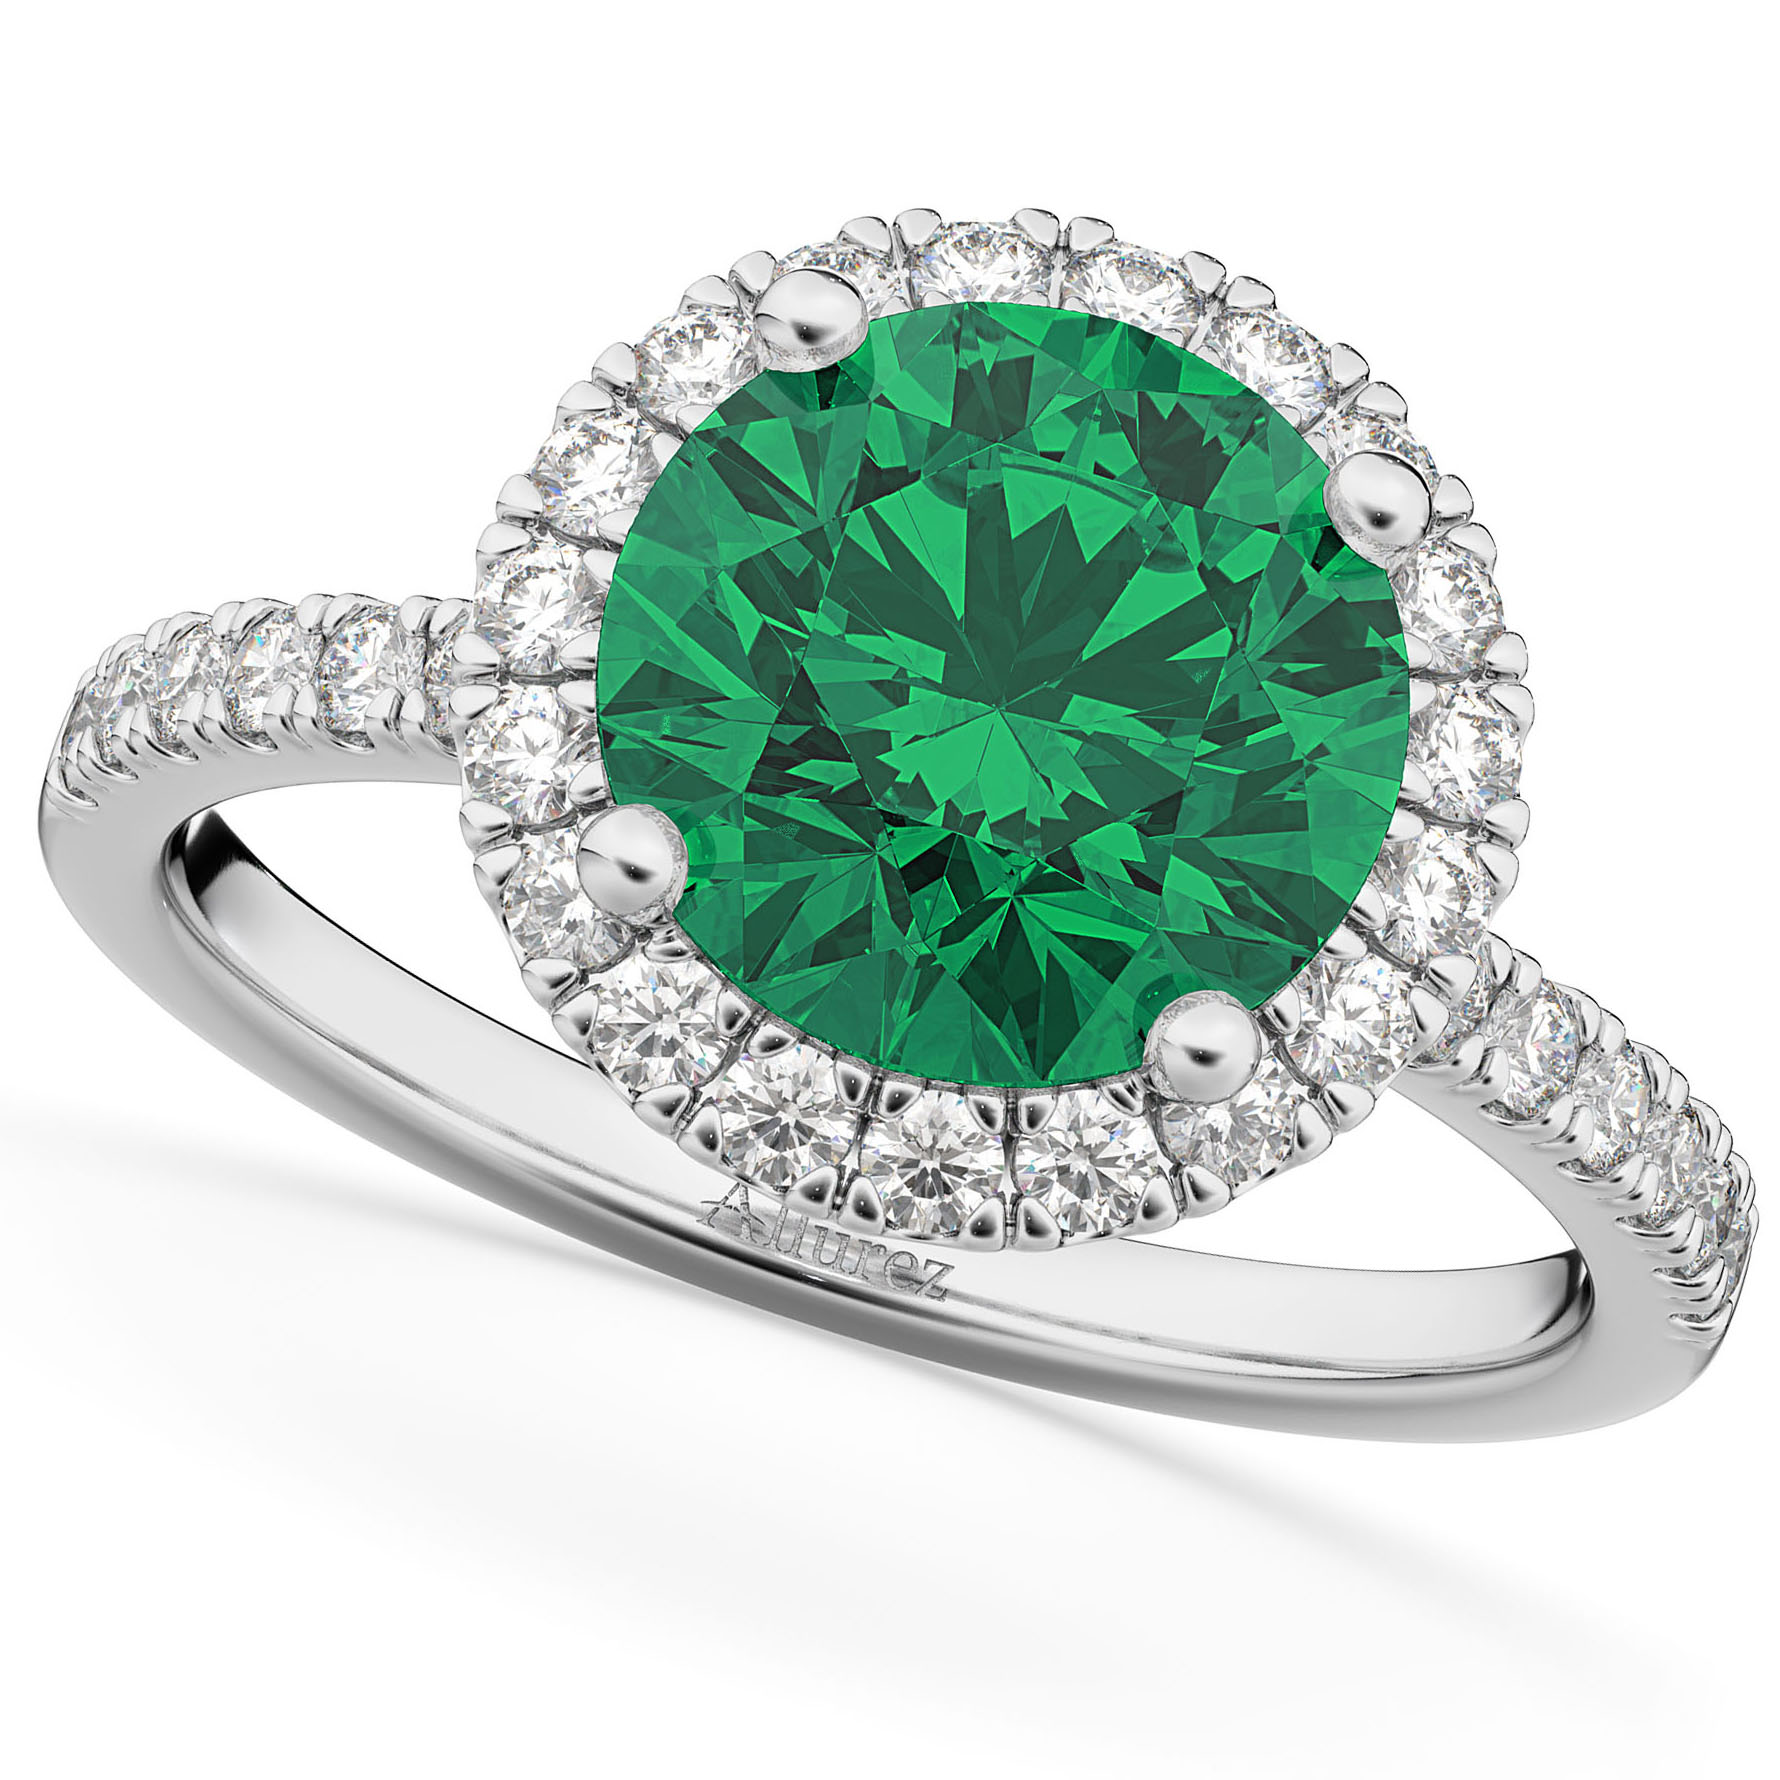 Halo Emerald & Diamond Engagement Ring Palladium 2.80ct